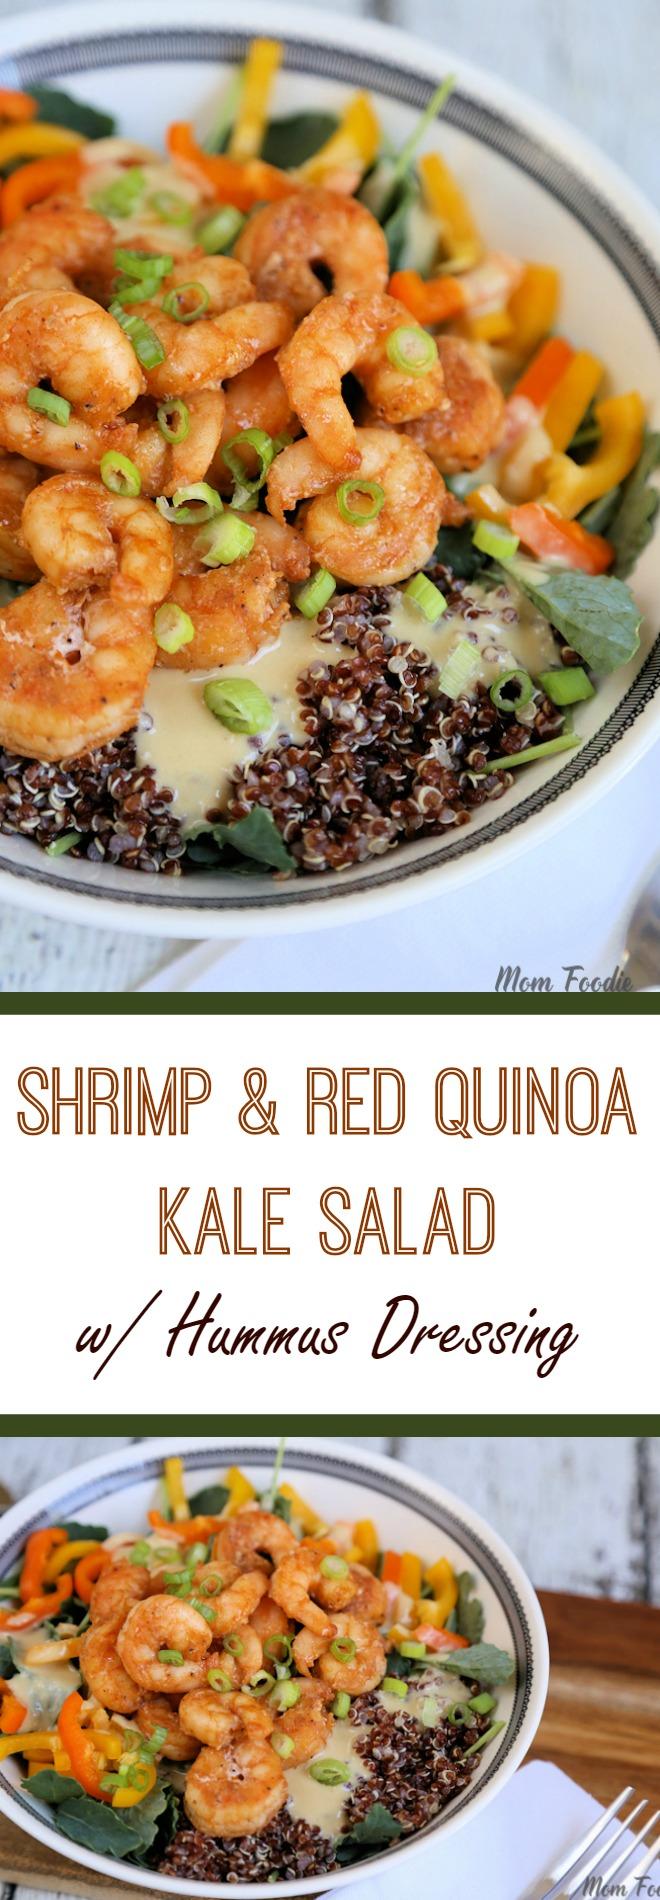 shrimp & Red Quinoa Salad